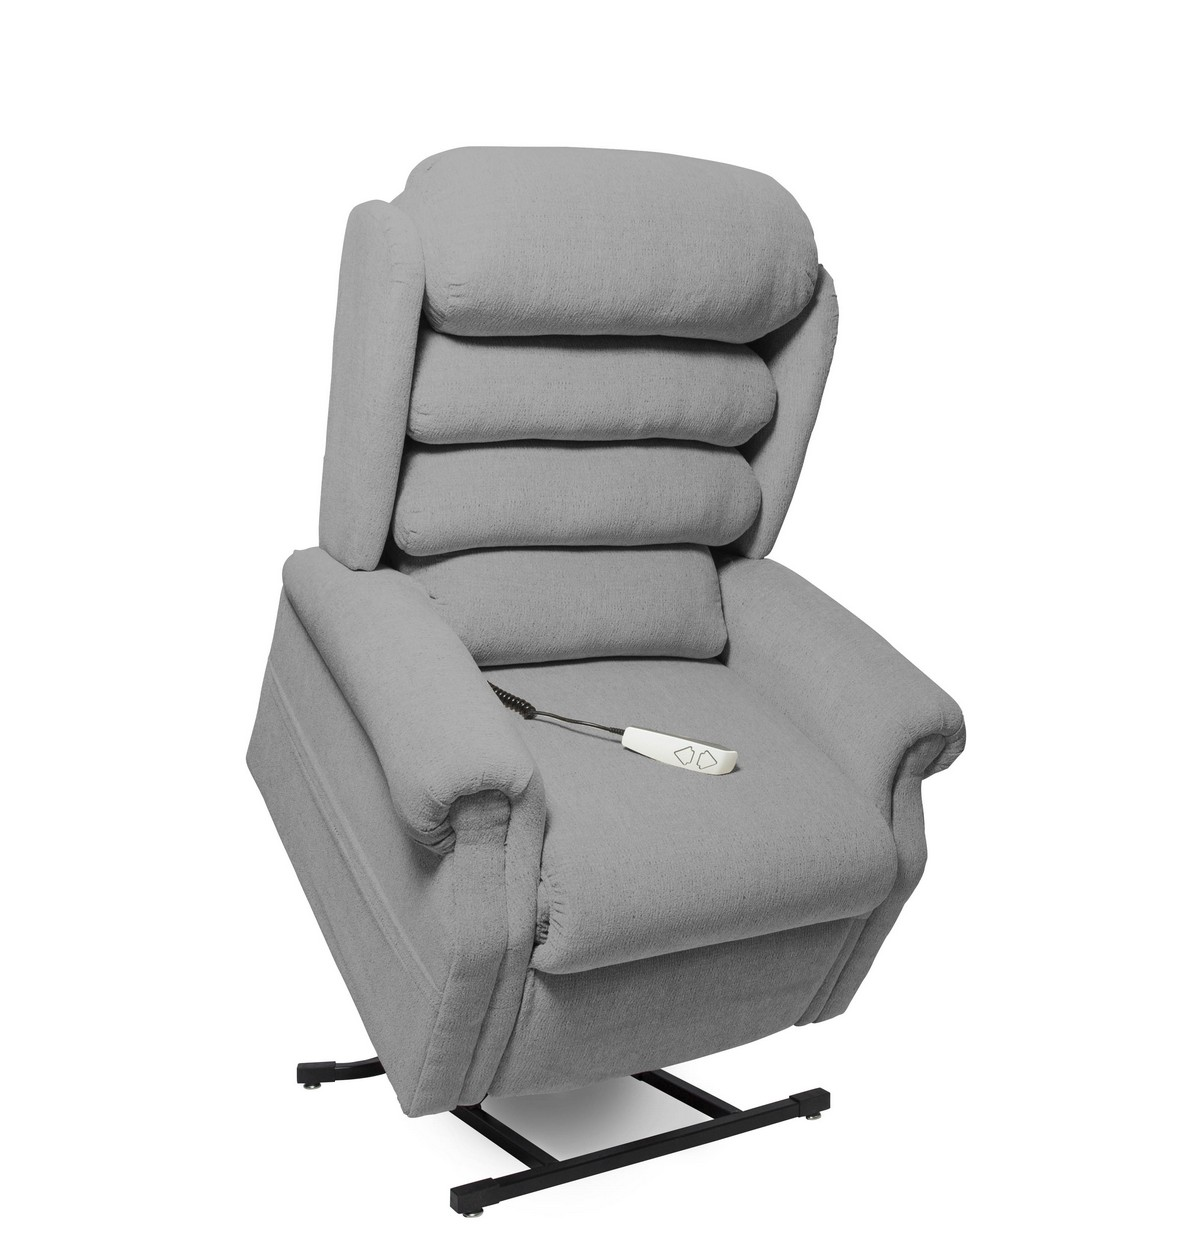 mega motion nm1950 stellar 3 position power lift chaise. Black Bedroom Furniture Sets. Home Design Ideas